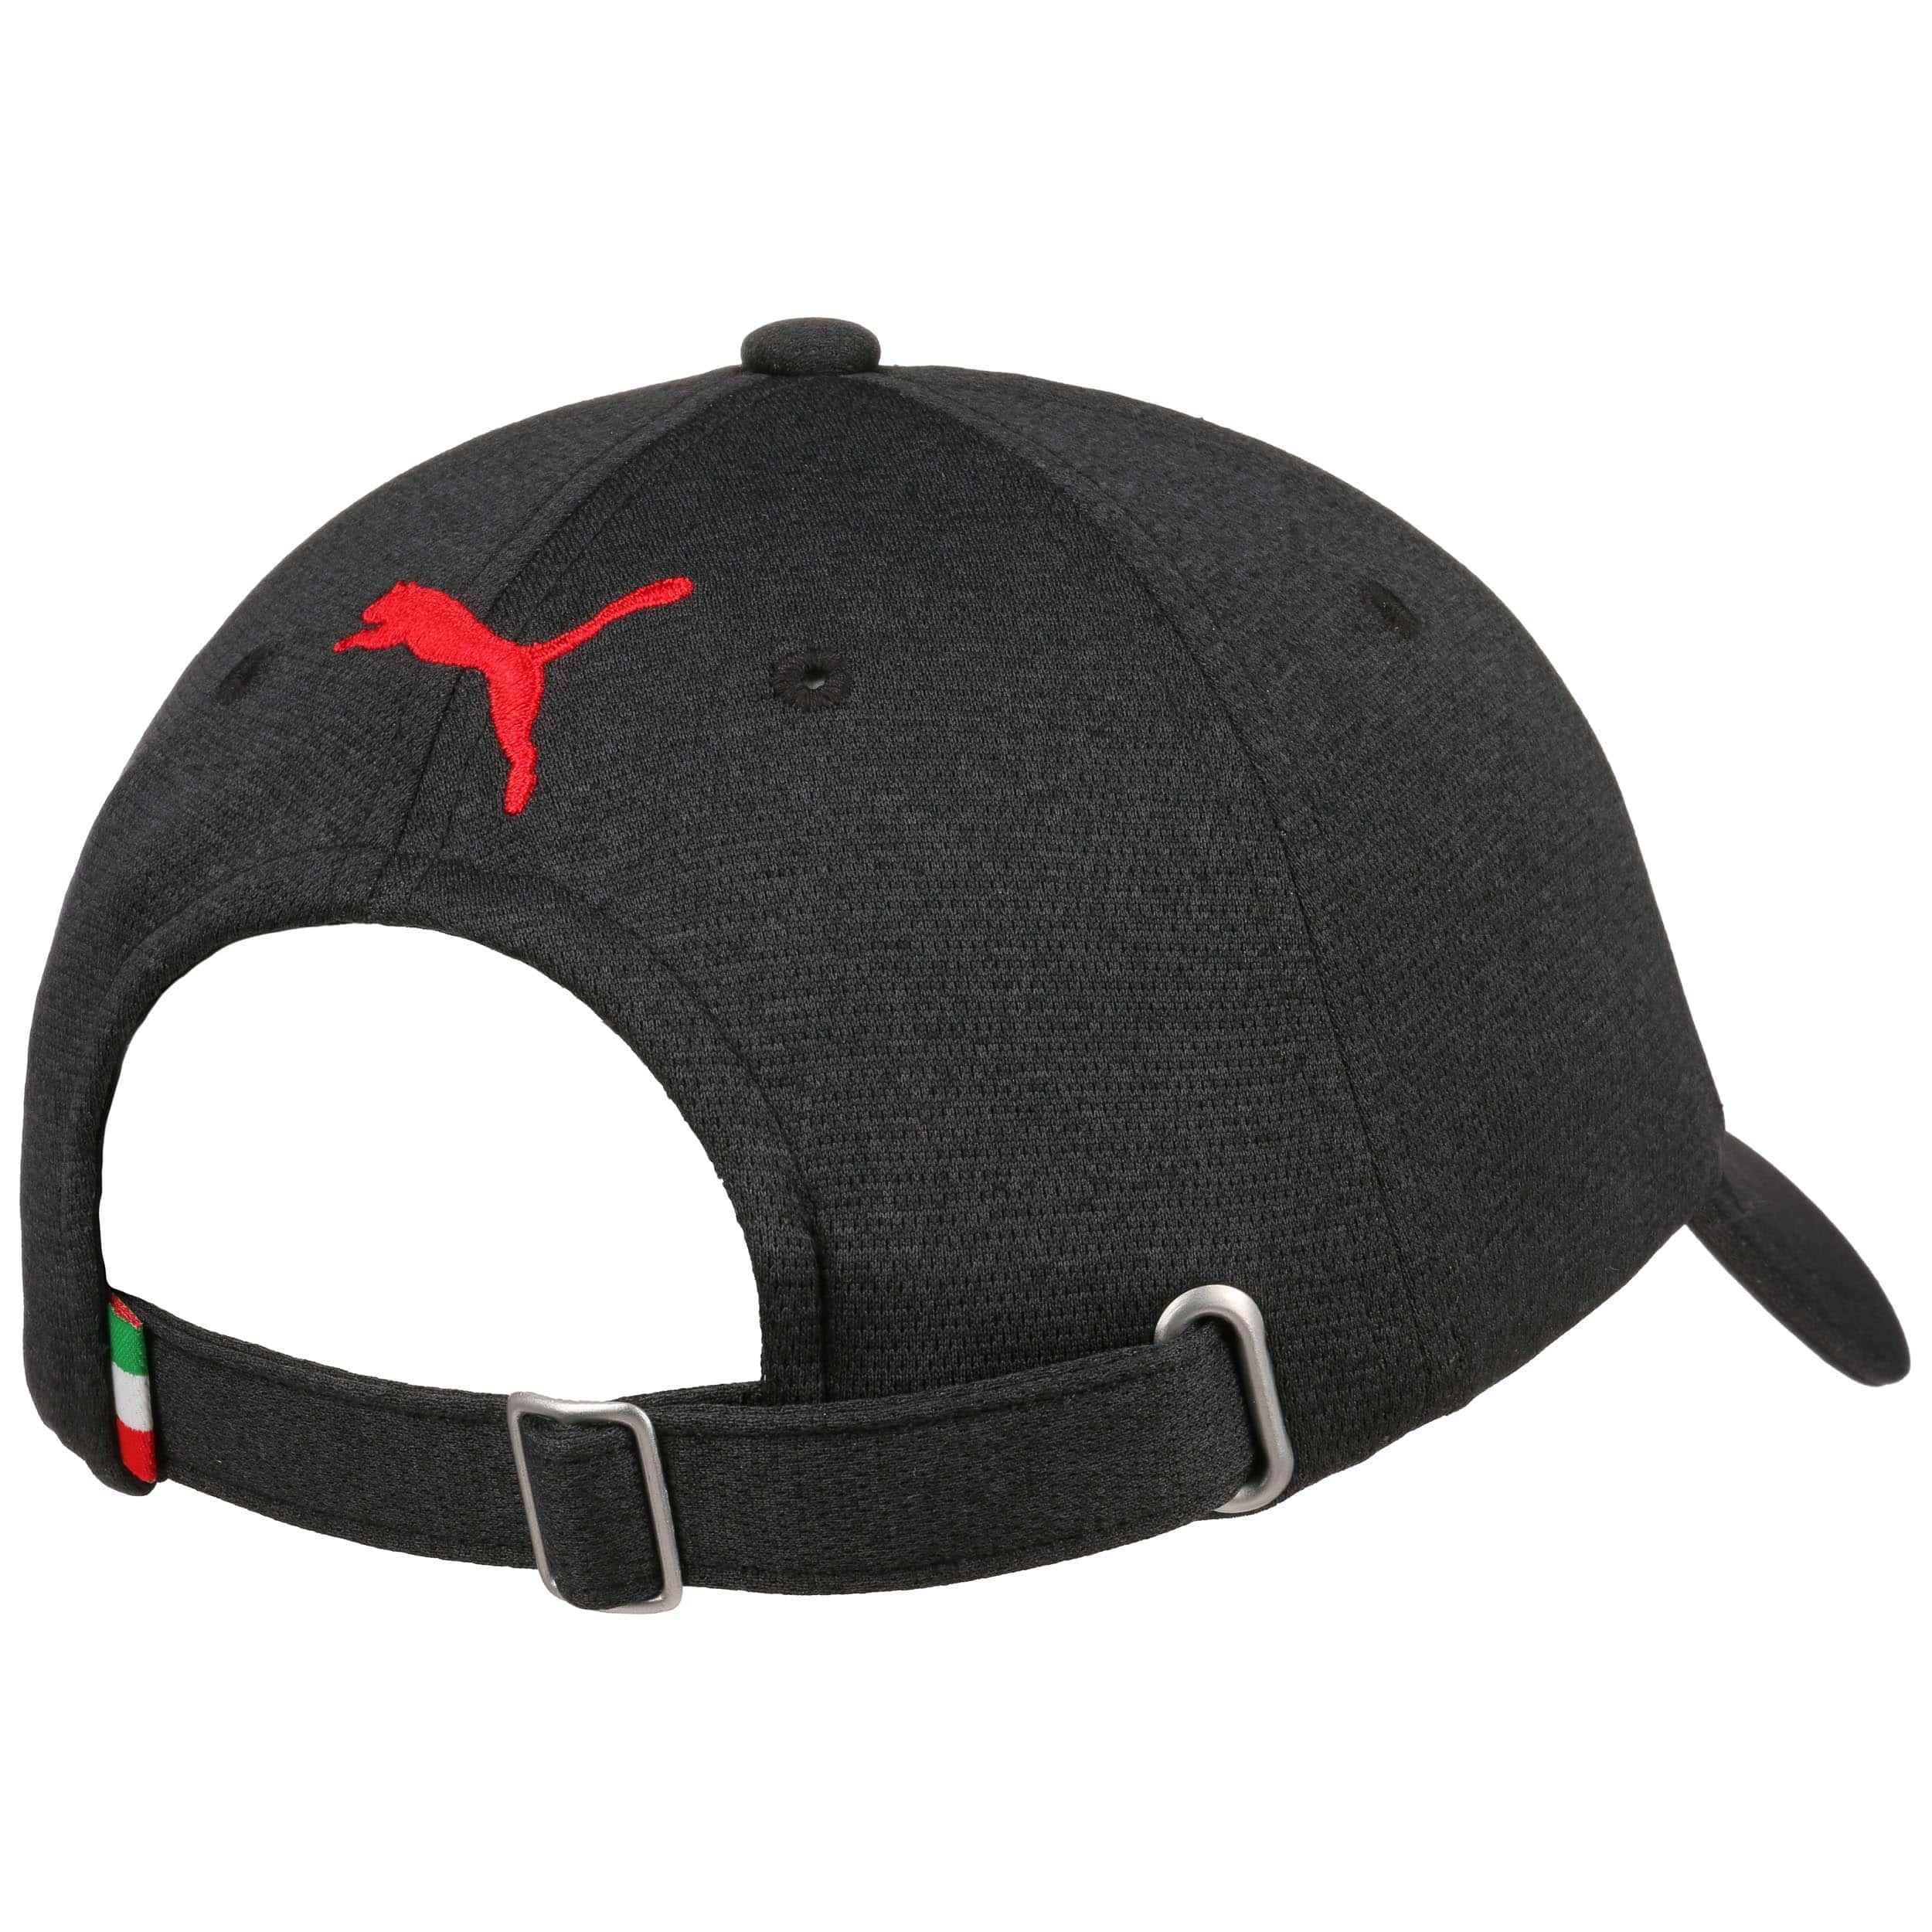 Gorra Scuderia Ferrari Fanwear by PUMA - Gorras - sombreroshop.es 8a5351e90be